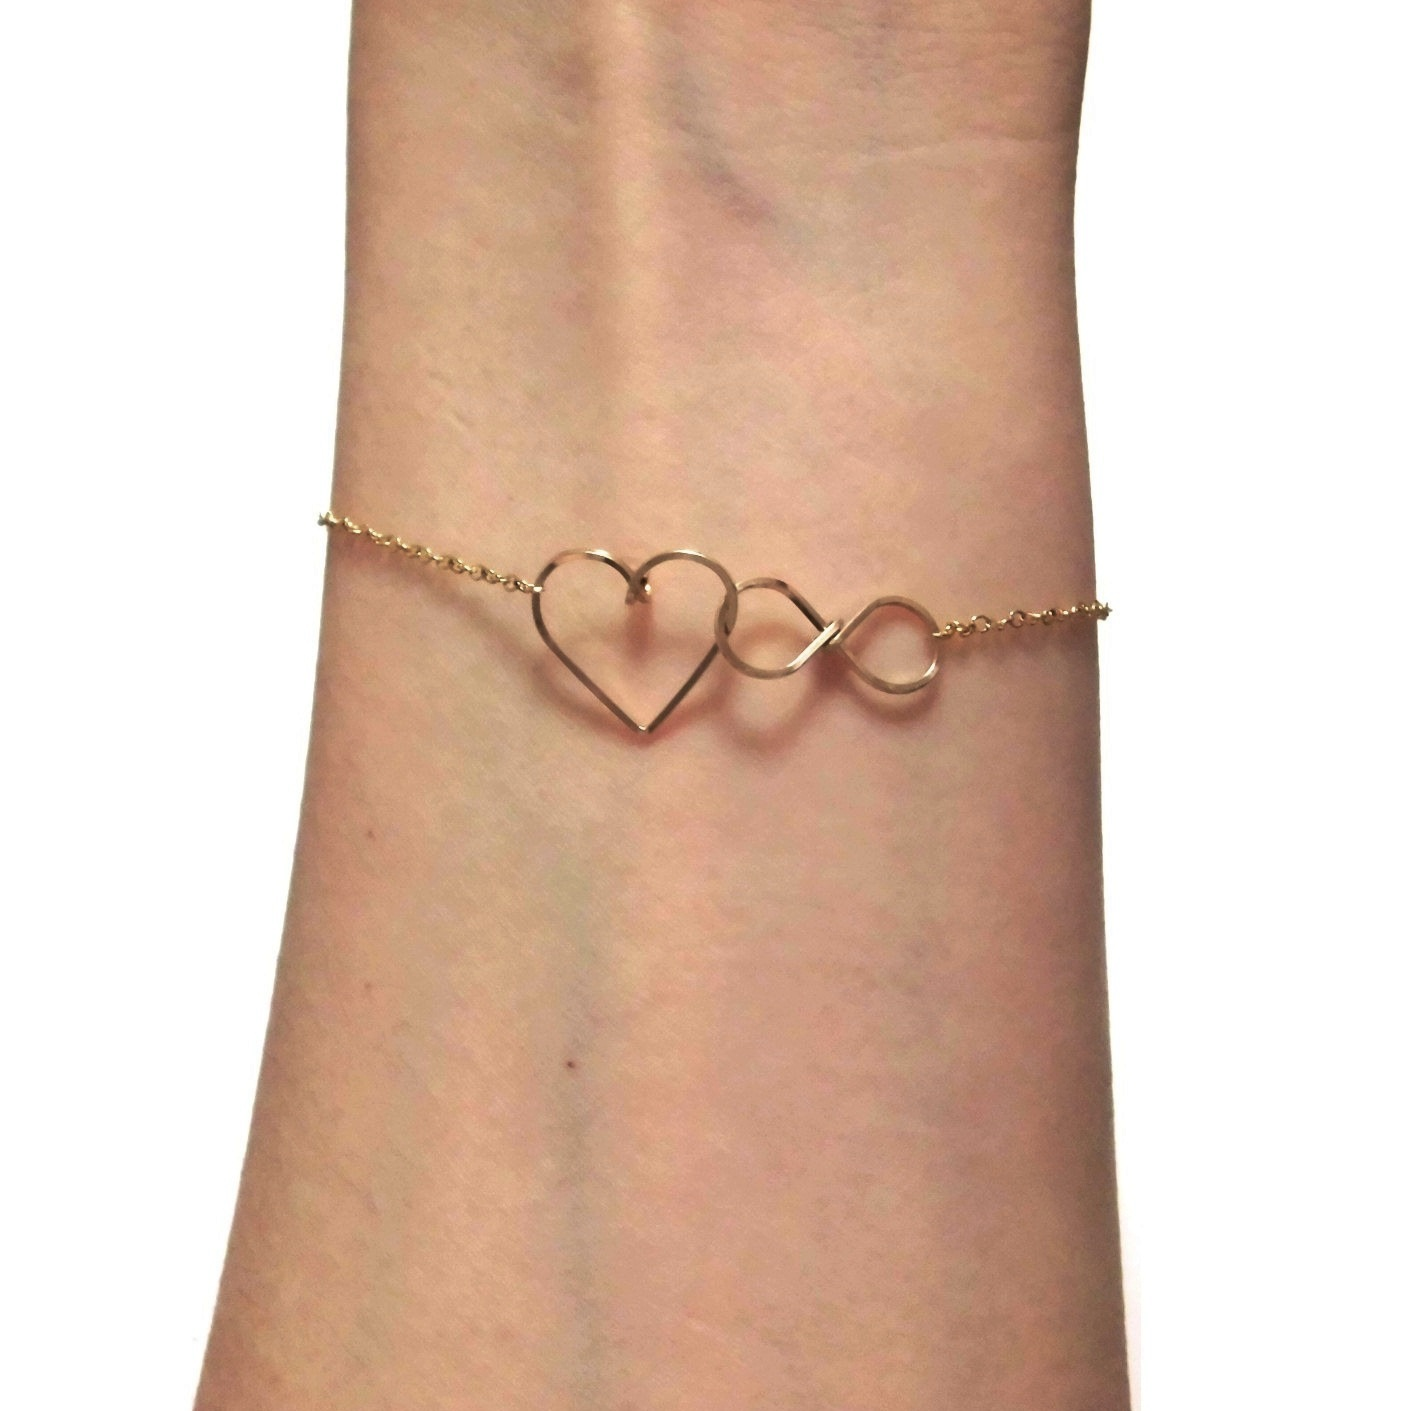 Infinite Love Bracelet - B605 gold (1)